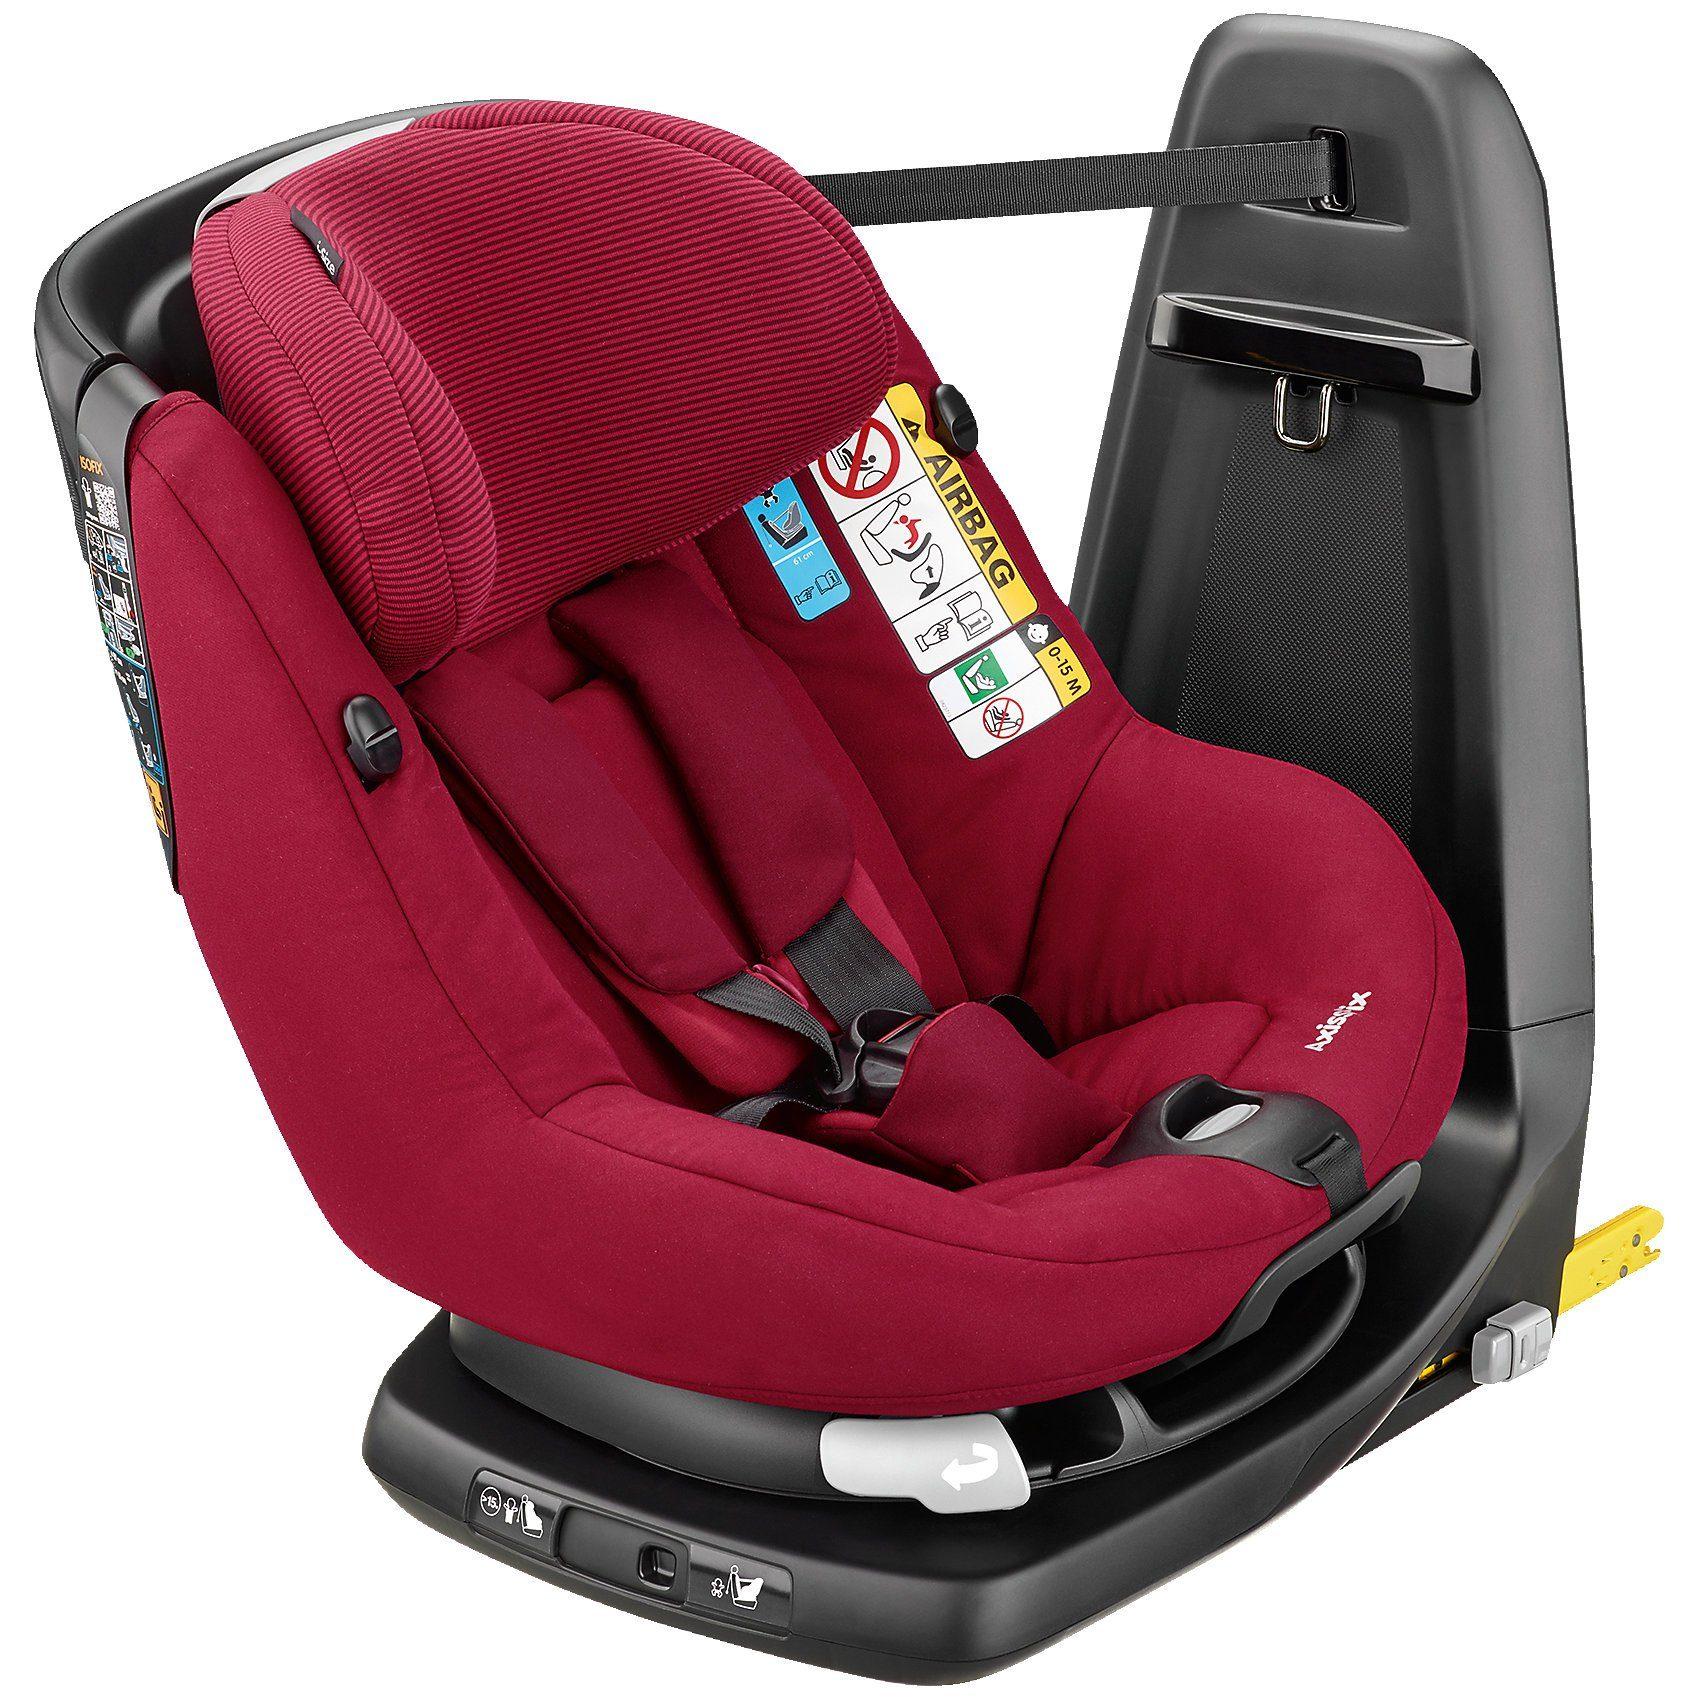 Maxi-Cosi Auto-Kindersitz Axissfix, Robin Red, 2017